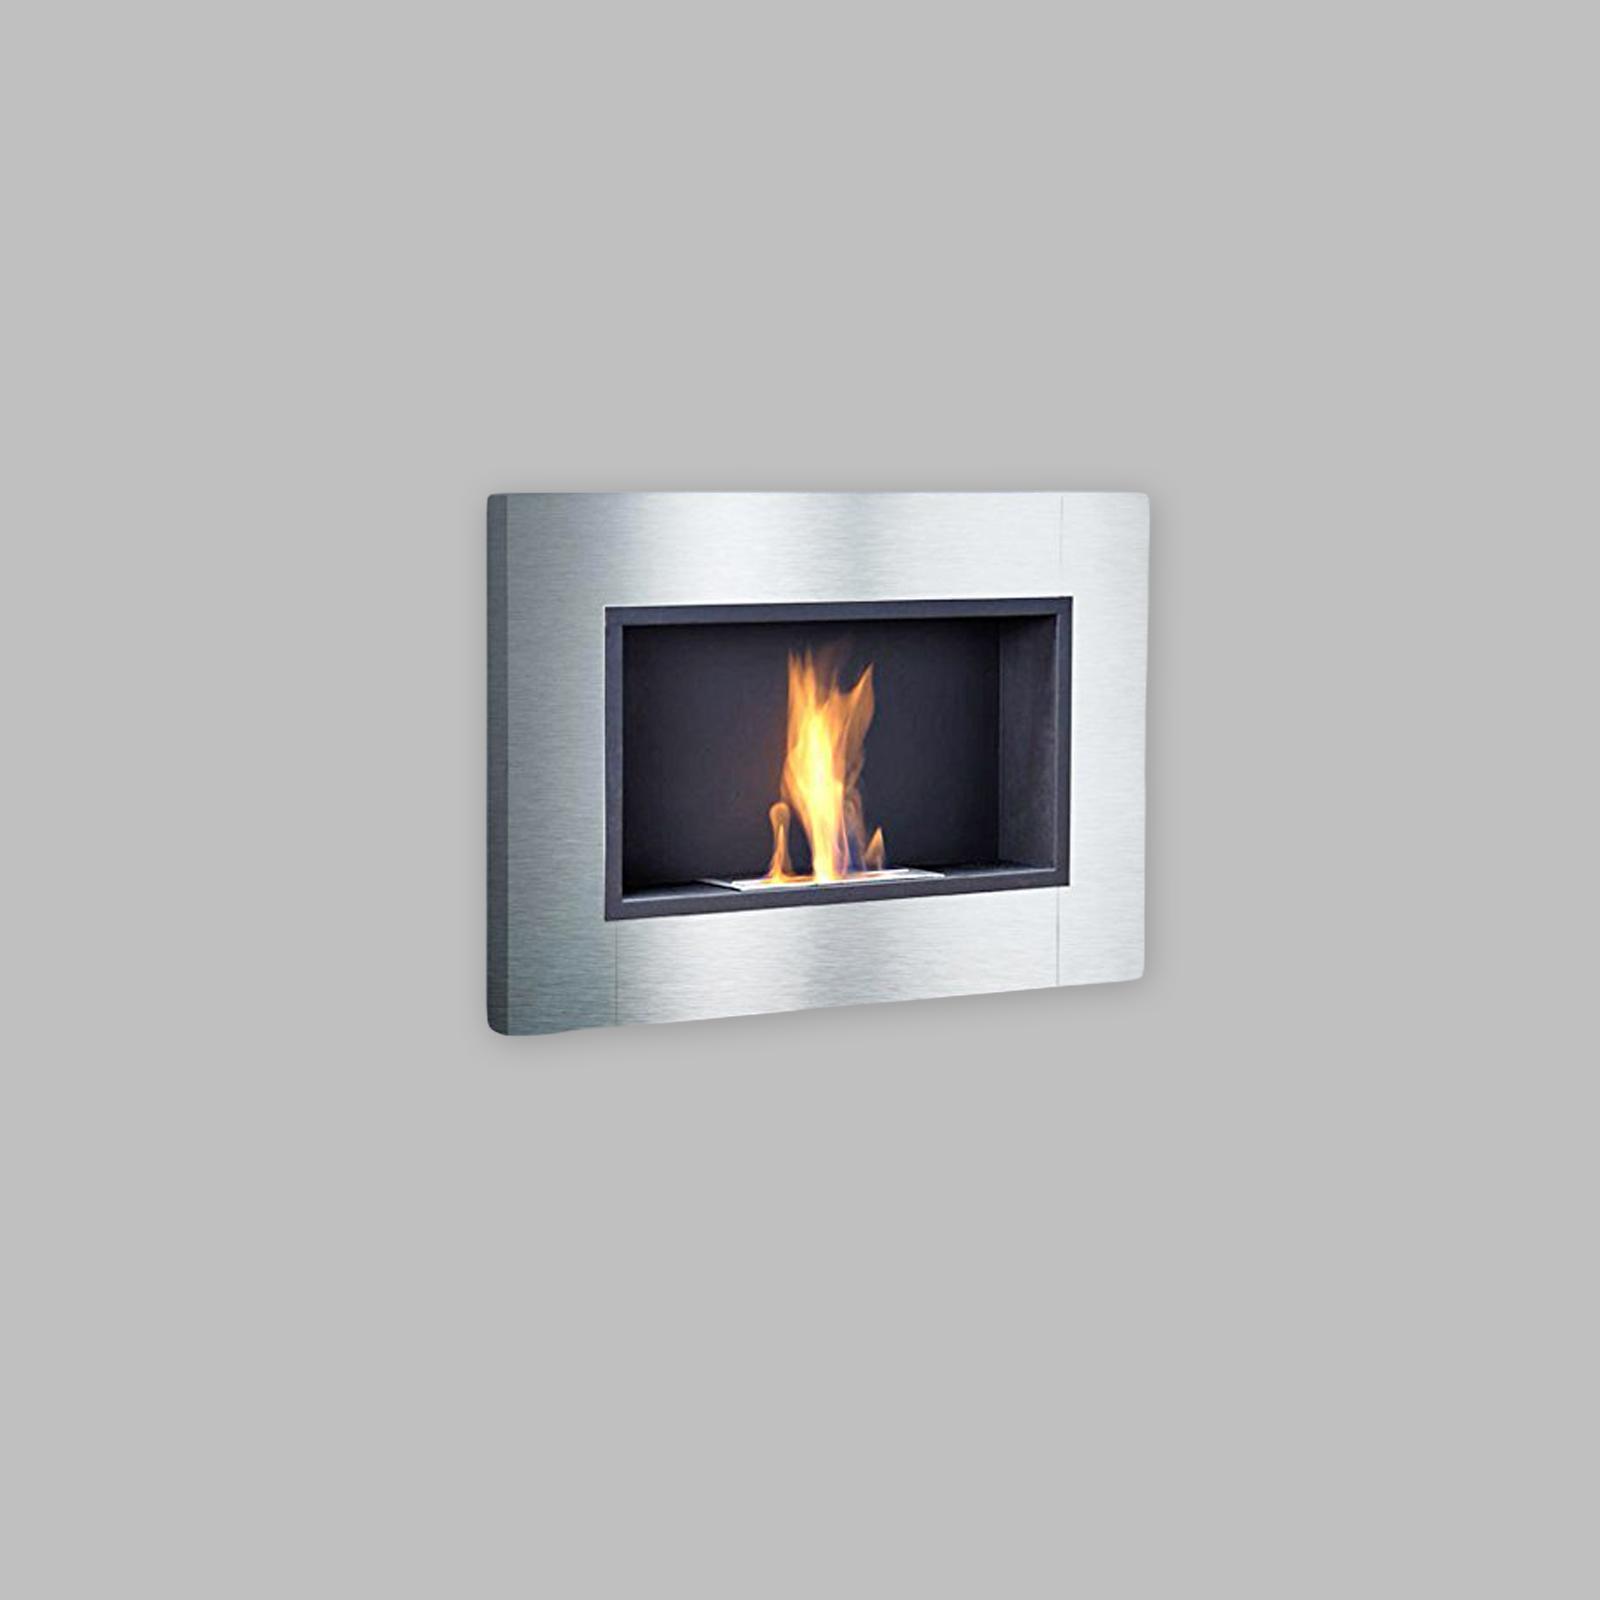 Luxury Stainless Steel Bio Ethanol Fireplace Gelkamin Gel